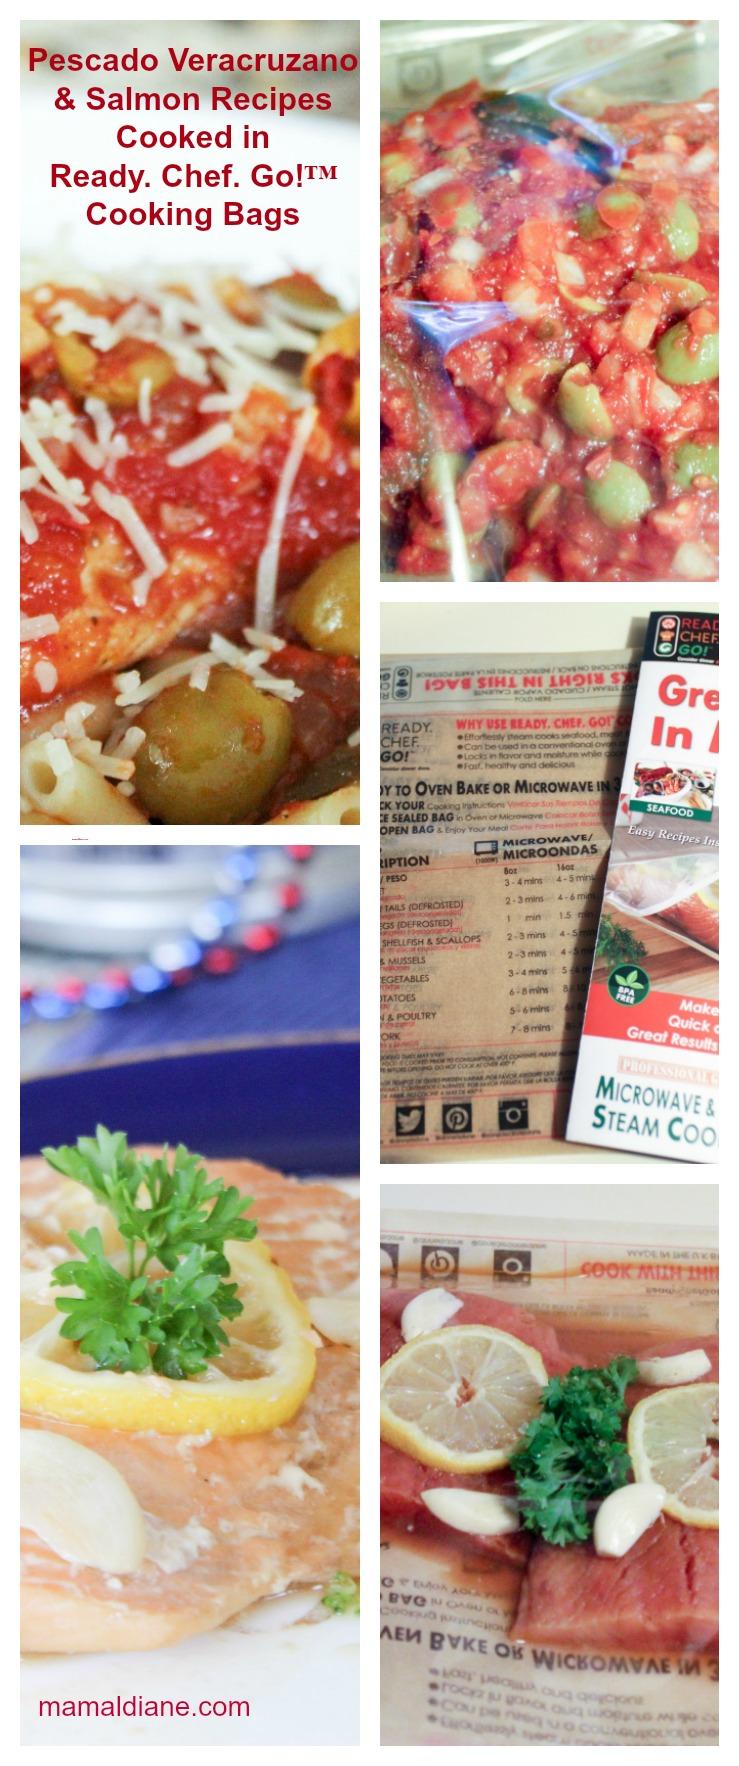 Pescado Veracruzano & Salmon Recipes Cooked in Ready. Chef. Go!™ Cooking Bags Collage